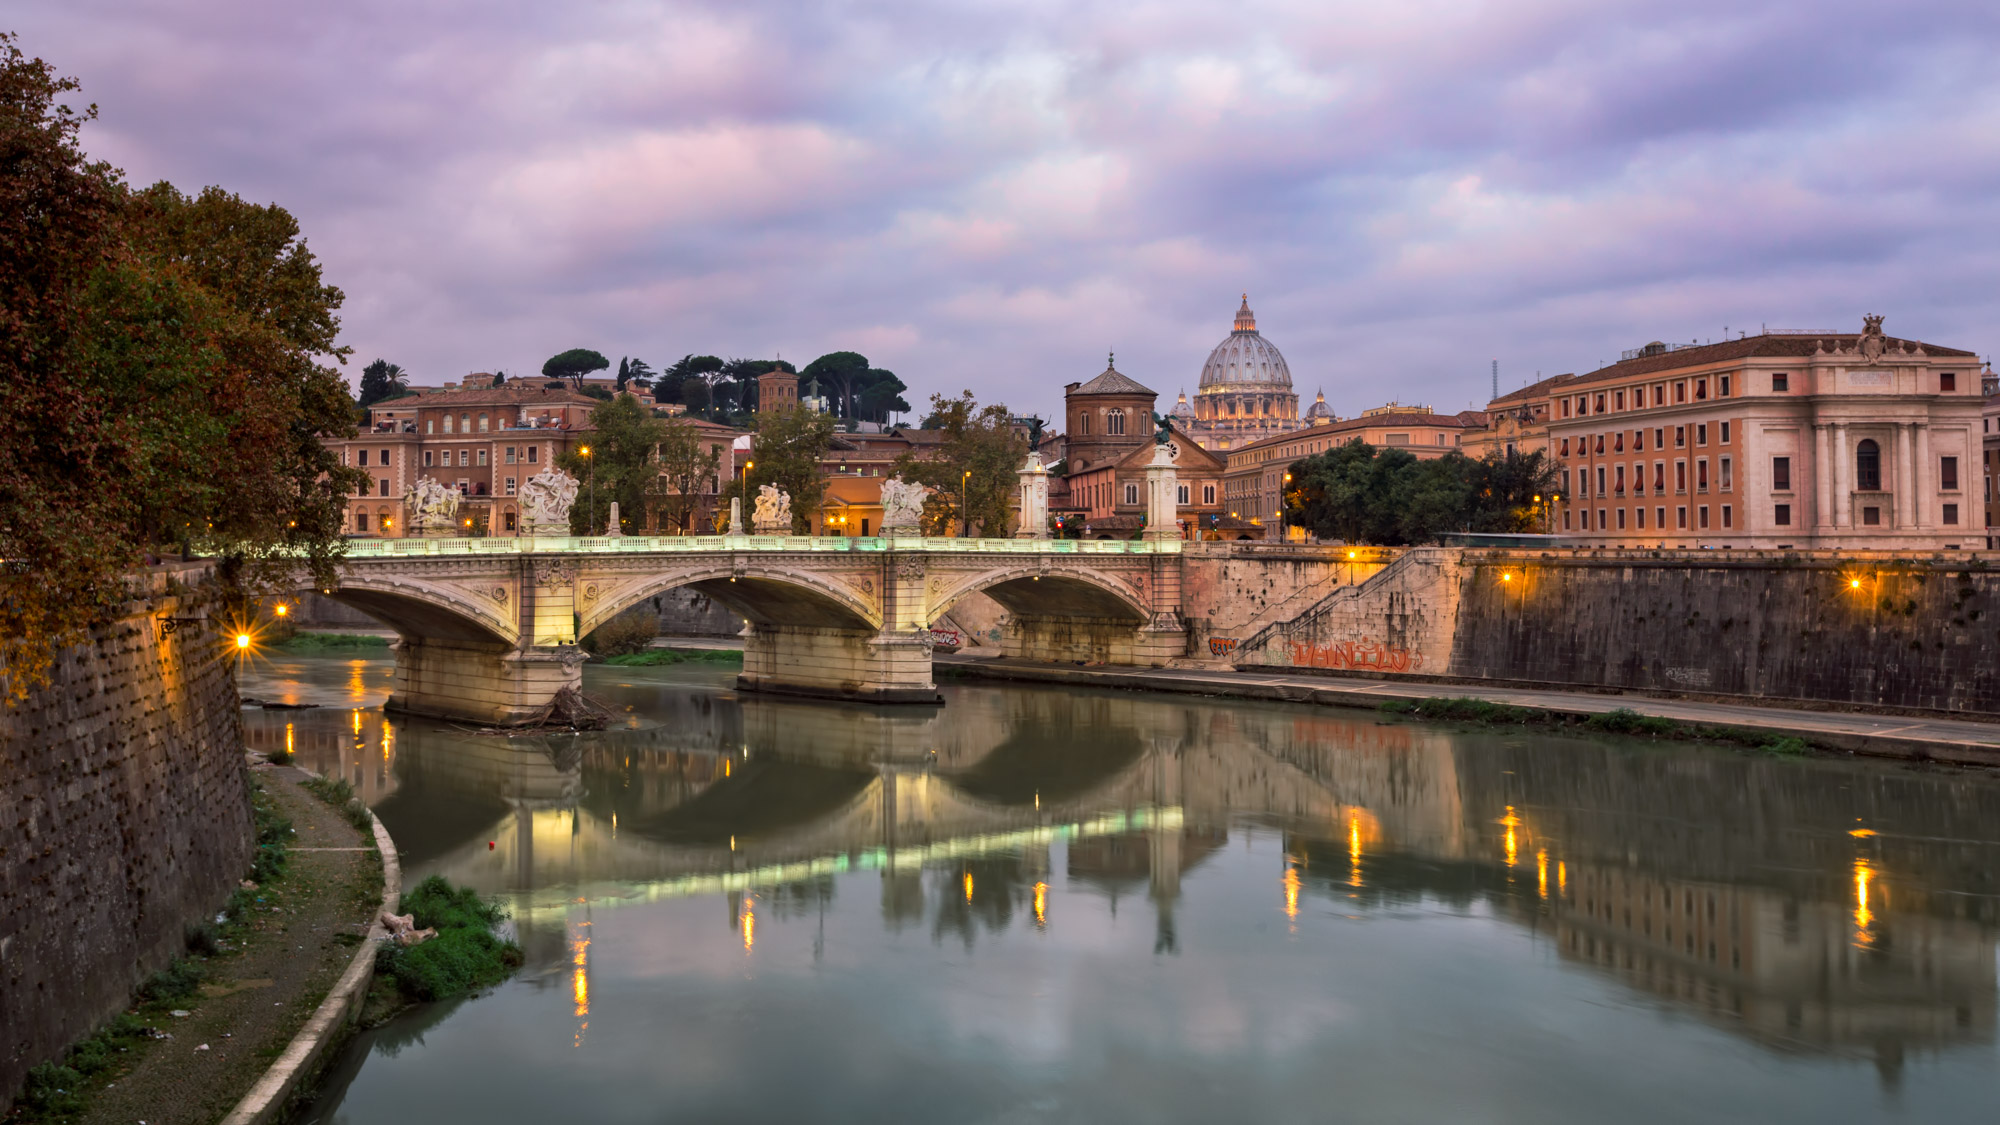 Vittorio Emmanuele II Bridge, Rome, Italy